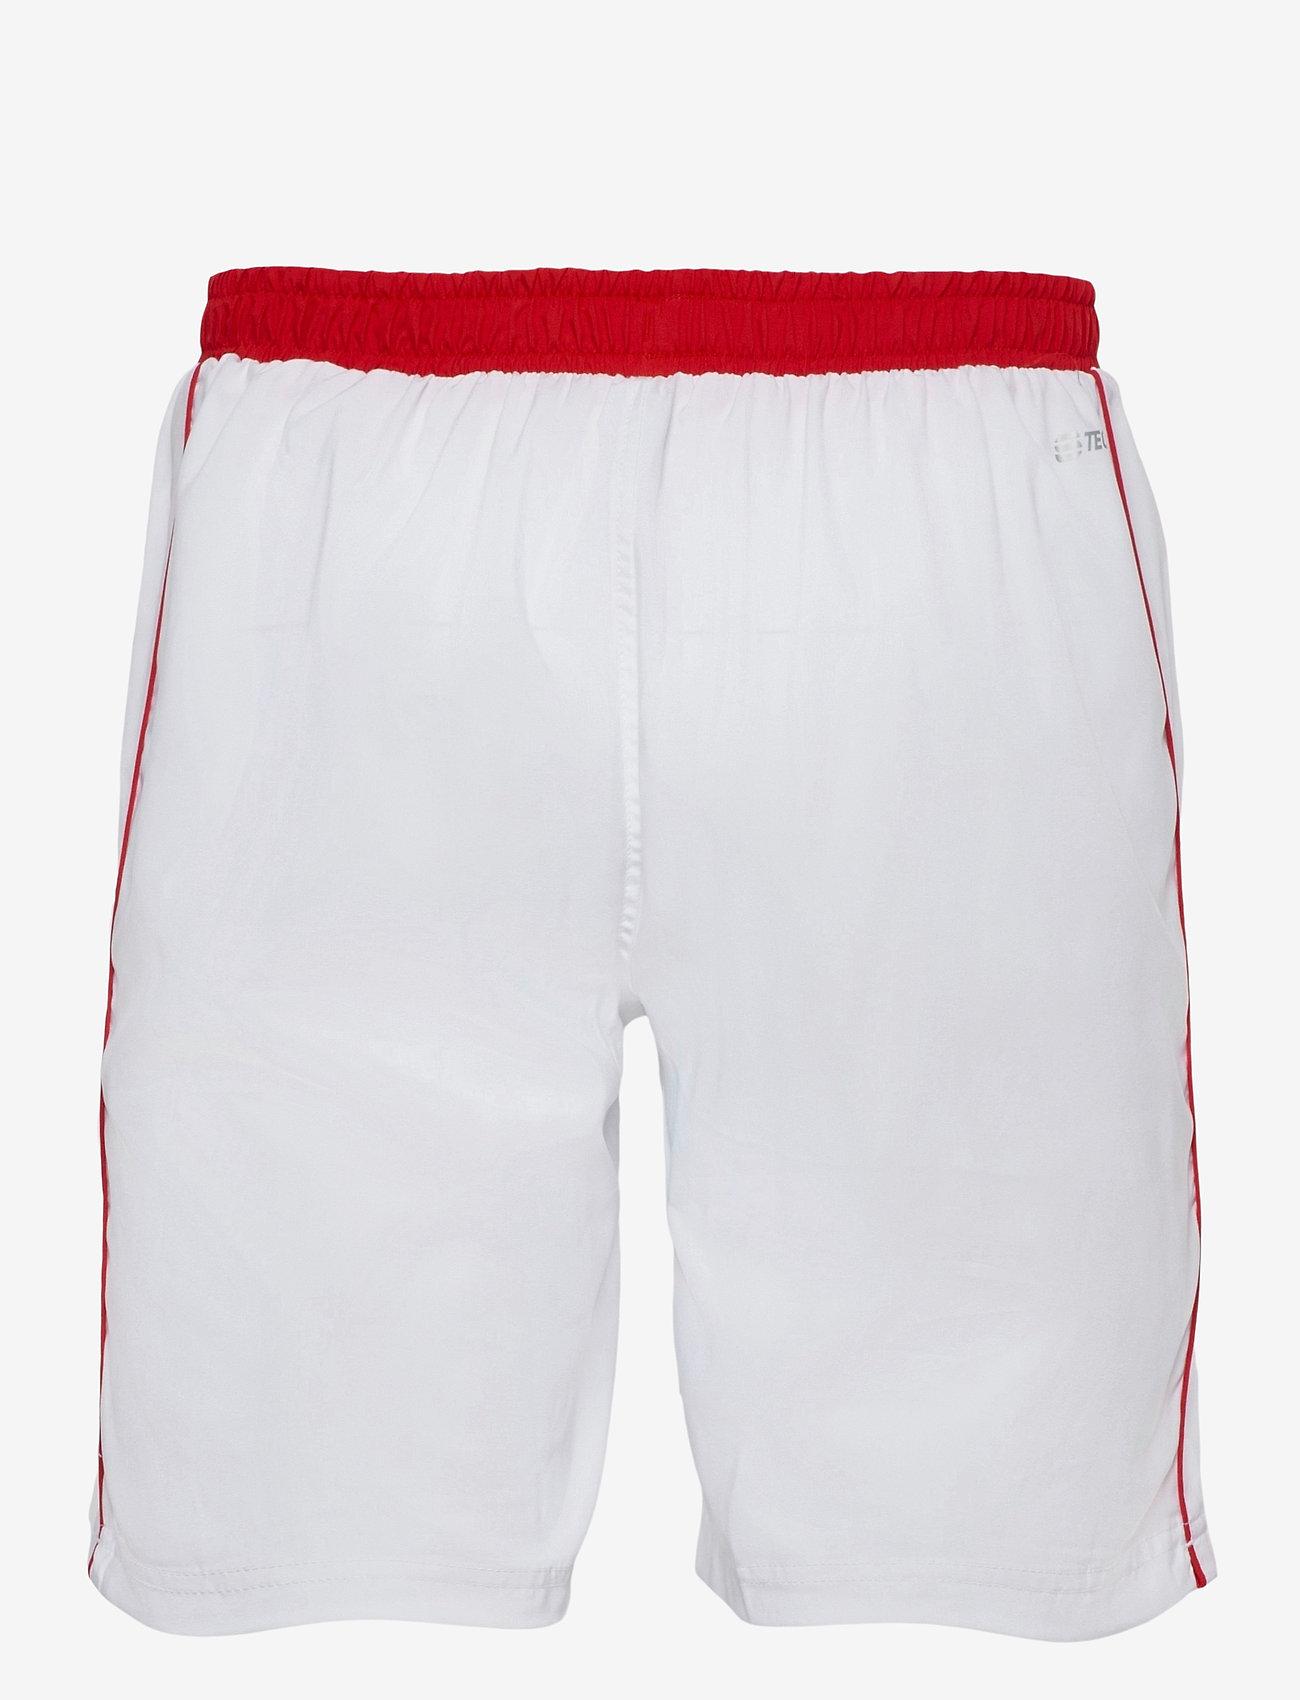 Sergio Tacchini - CLUB TECH SHORTS - træningsshorts - white/red - 1